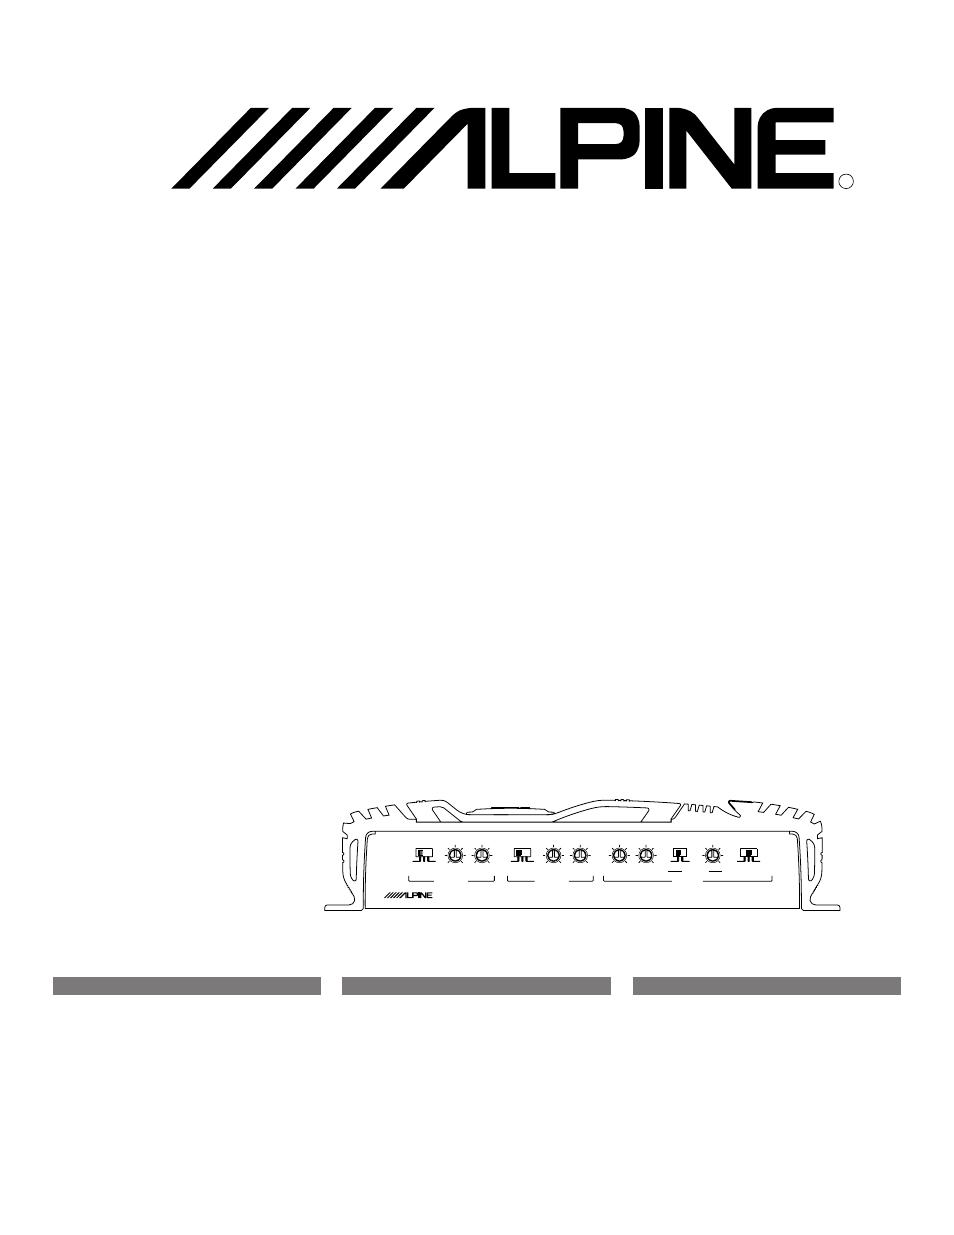 Alpine Mrv F307 Amp Wiring Diagram : 34 Wiring Diagram